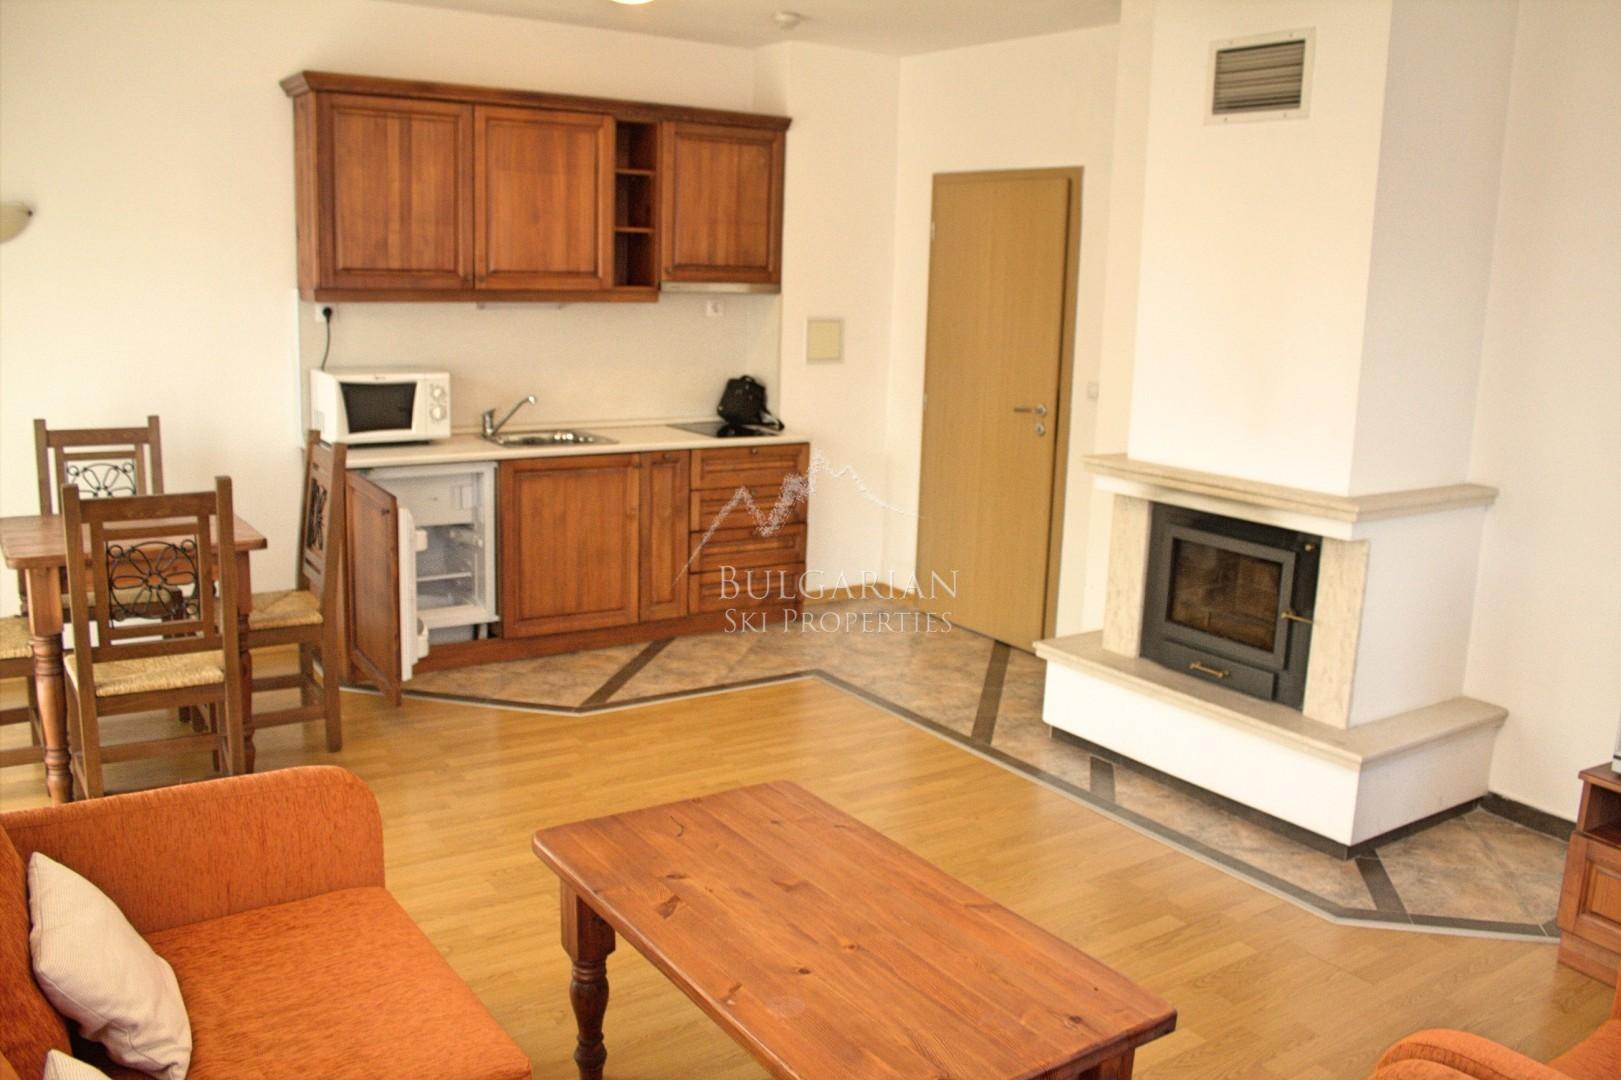 Уютен двустаен апартамент за продажба в Уинслоу Елеганс, Банско